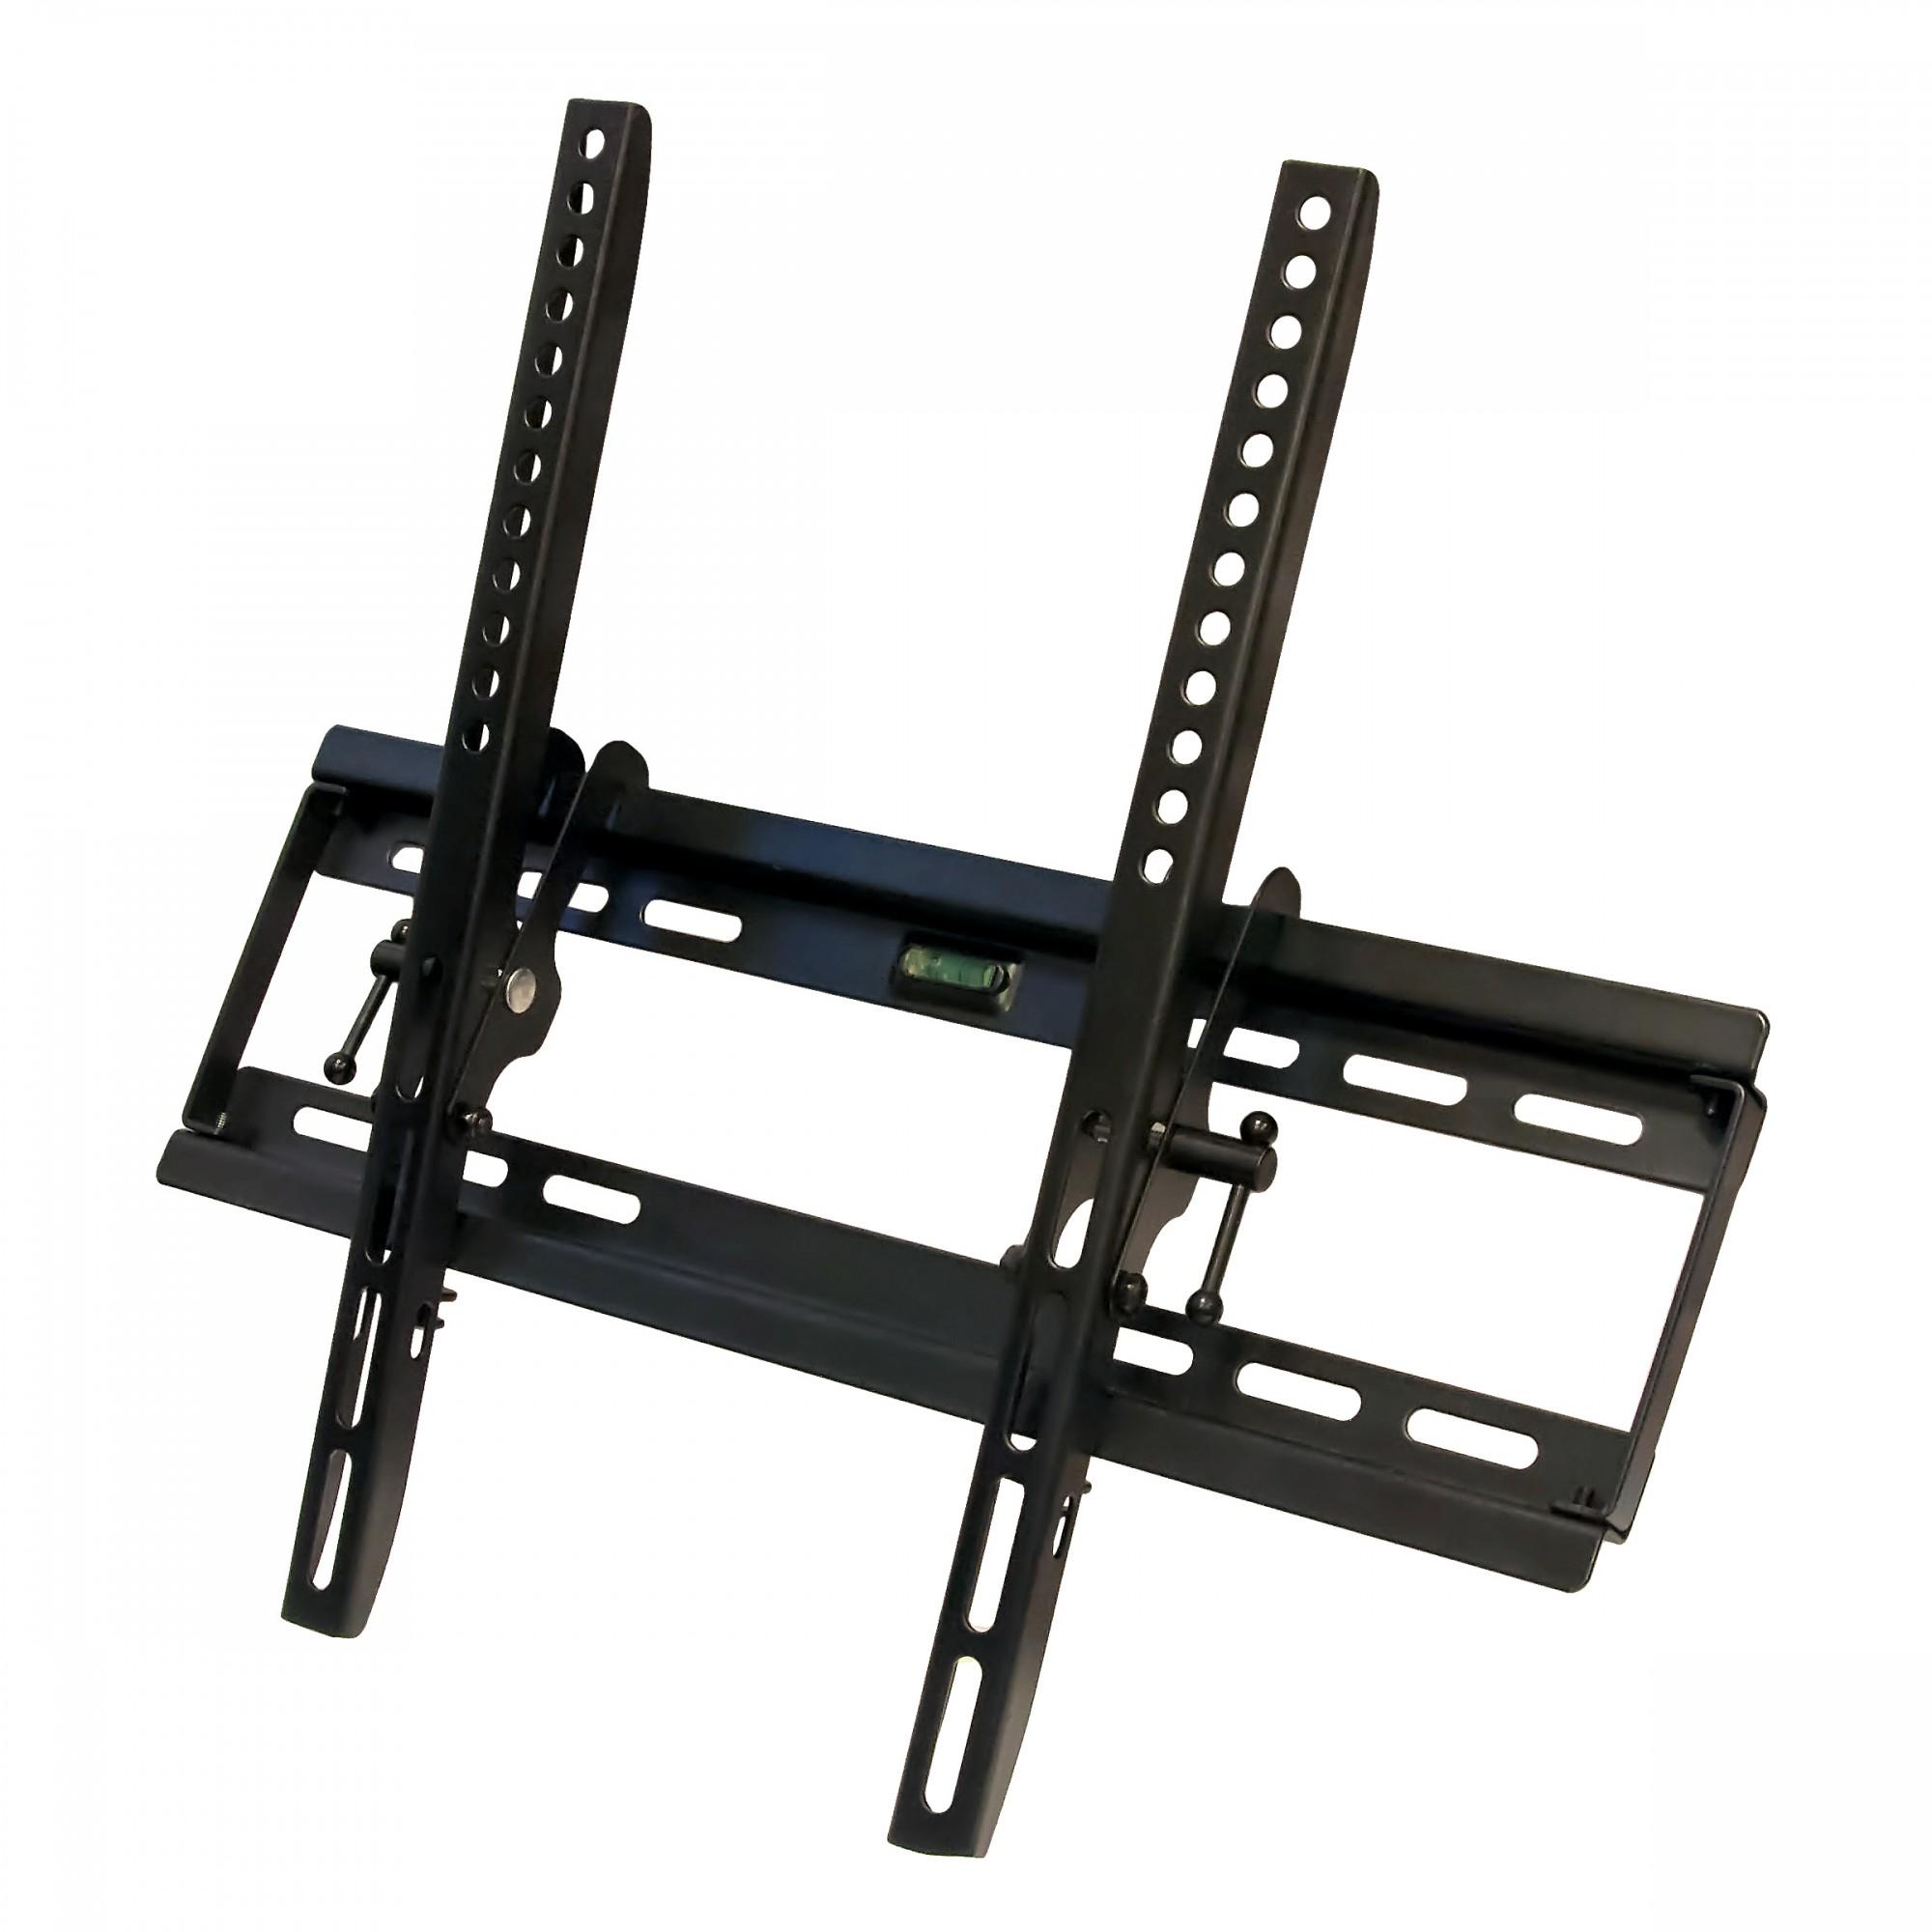 nemaxx 23 42 wandhalterung wandhalter sk3 f r led plasma tv fernseher monitor ebay. Black Bedroom Furniture Sets. Home Design Ideas